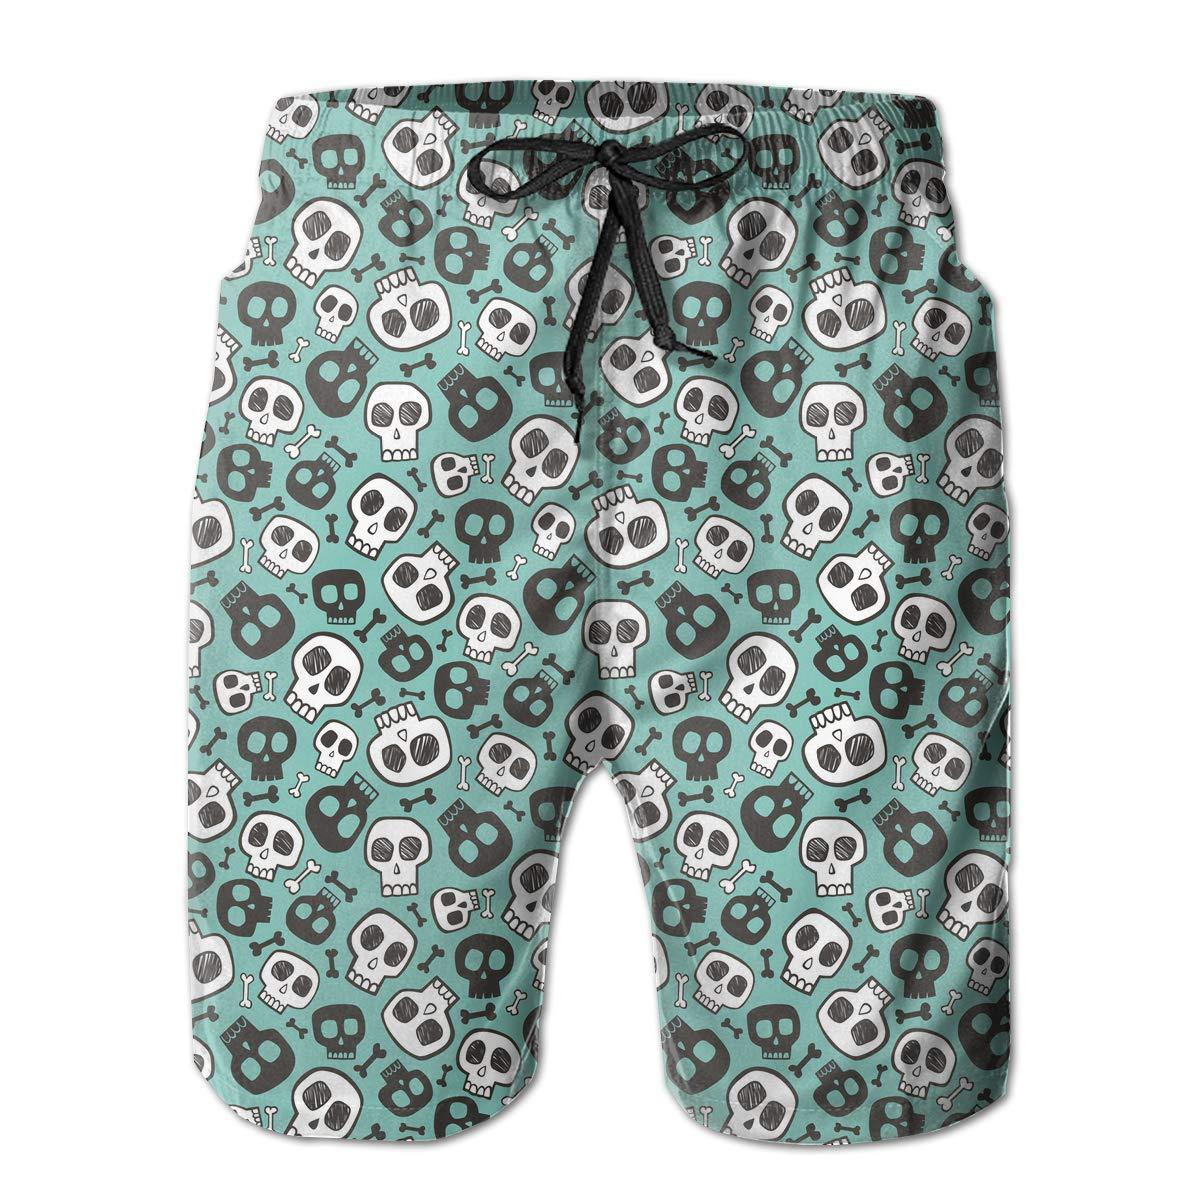 HFSST Green Halloween Skull Mens Swim Trunks Bathing Suit Shorts Board Beach